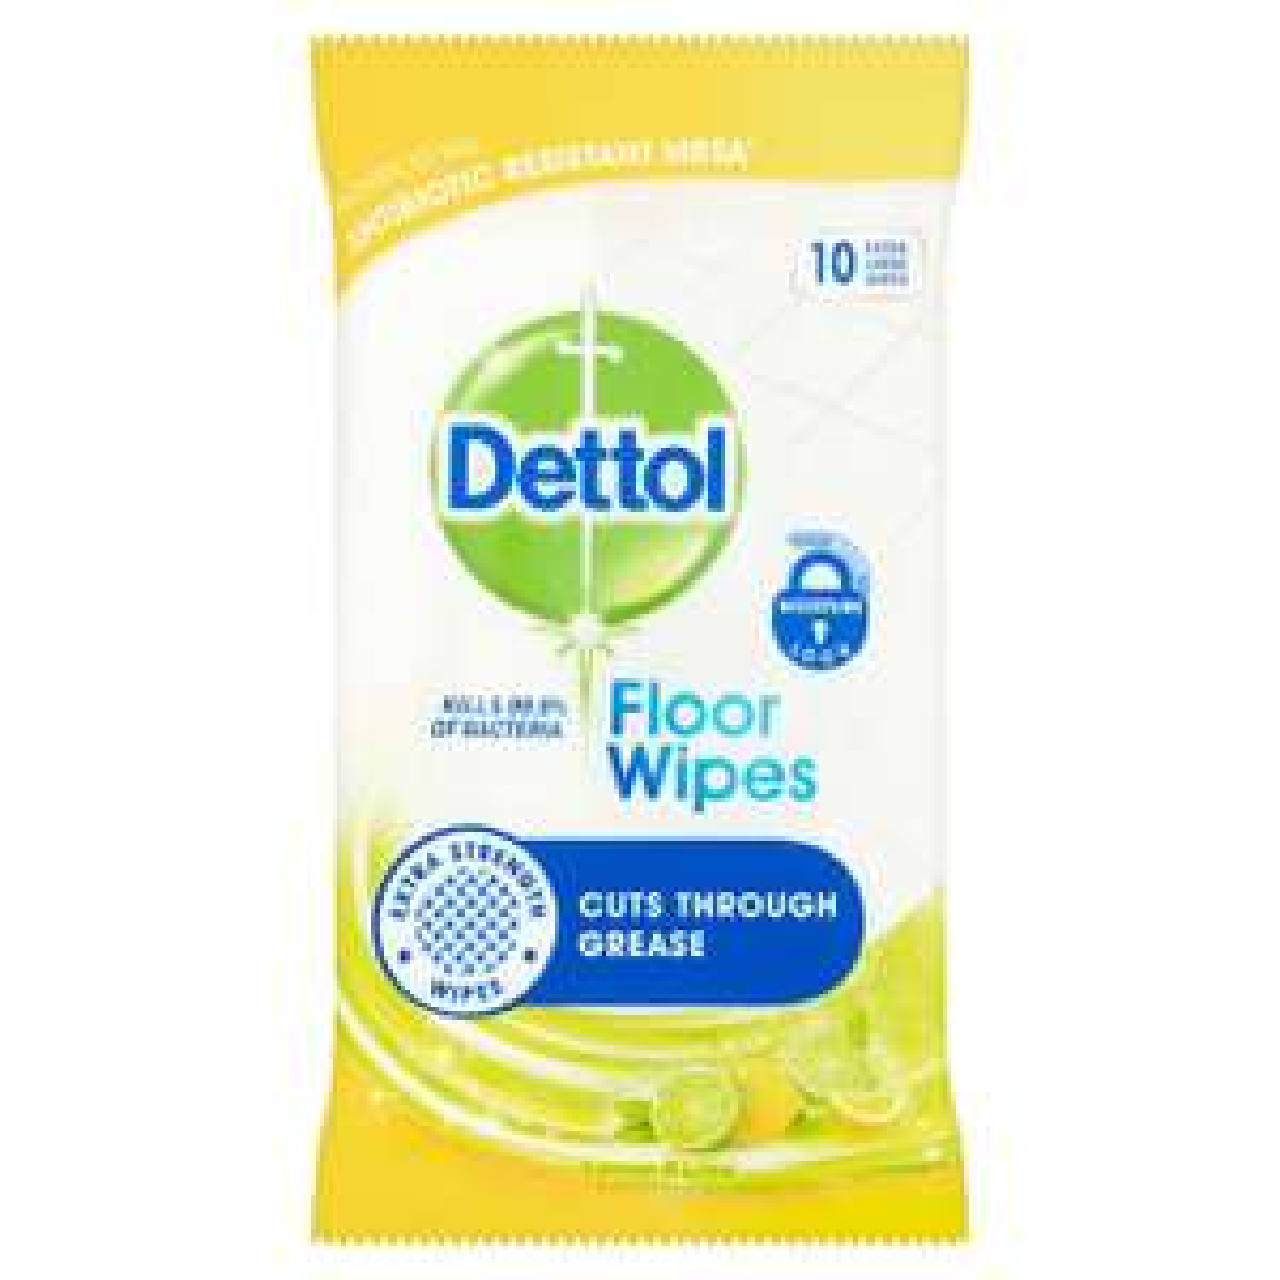 Dettol floor wipes 50p at Morrisons